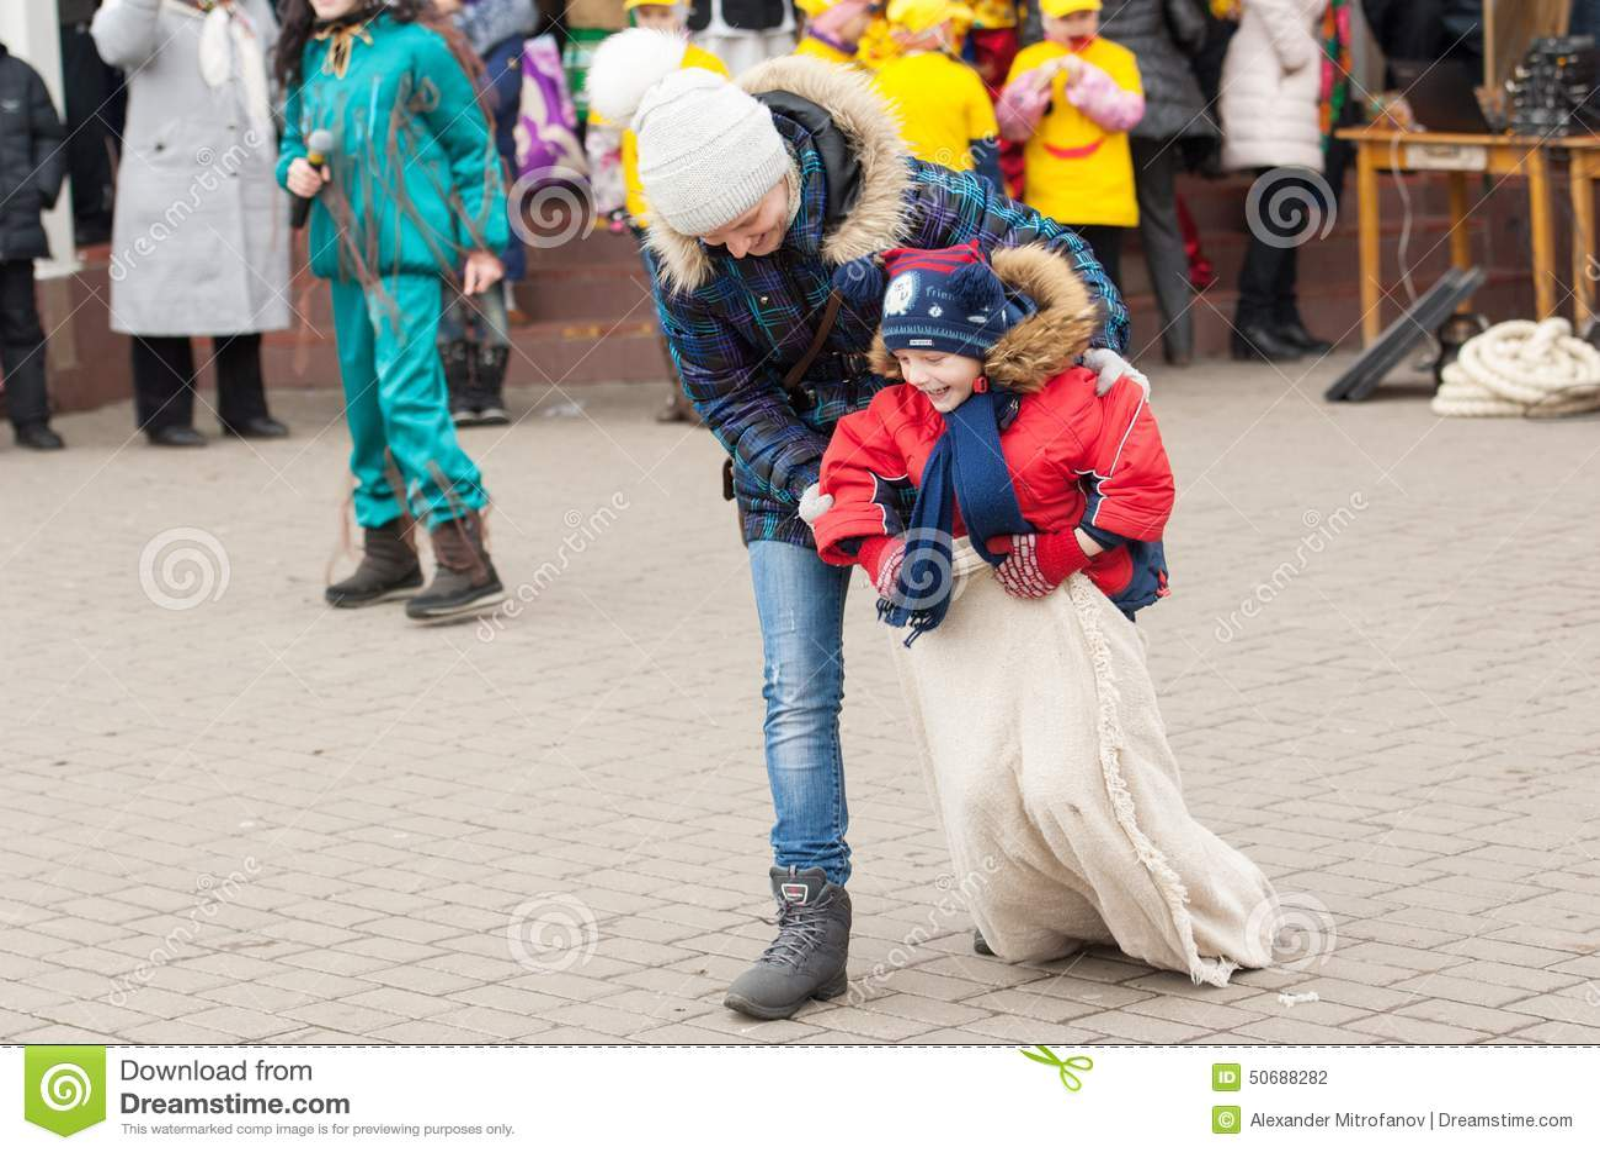 Download 母亲帮助奔跑 图库摄影片. 图片 包括有 比赛, 帮助, 诱饵, 节假日, 愉快, 服装, 招待, 种族 - 50688282